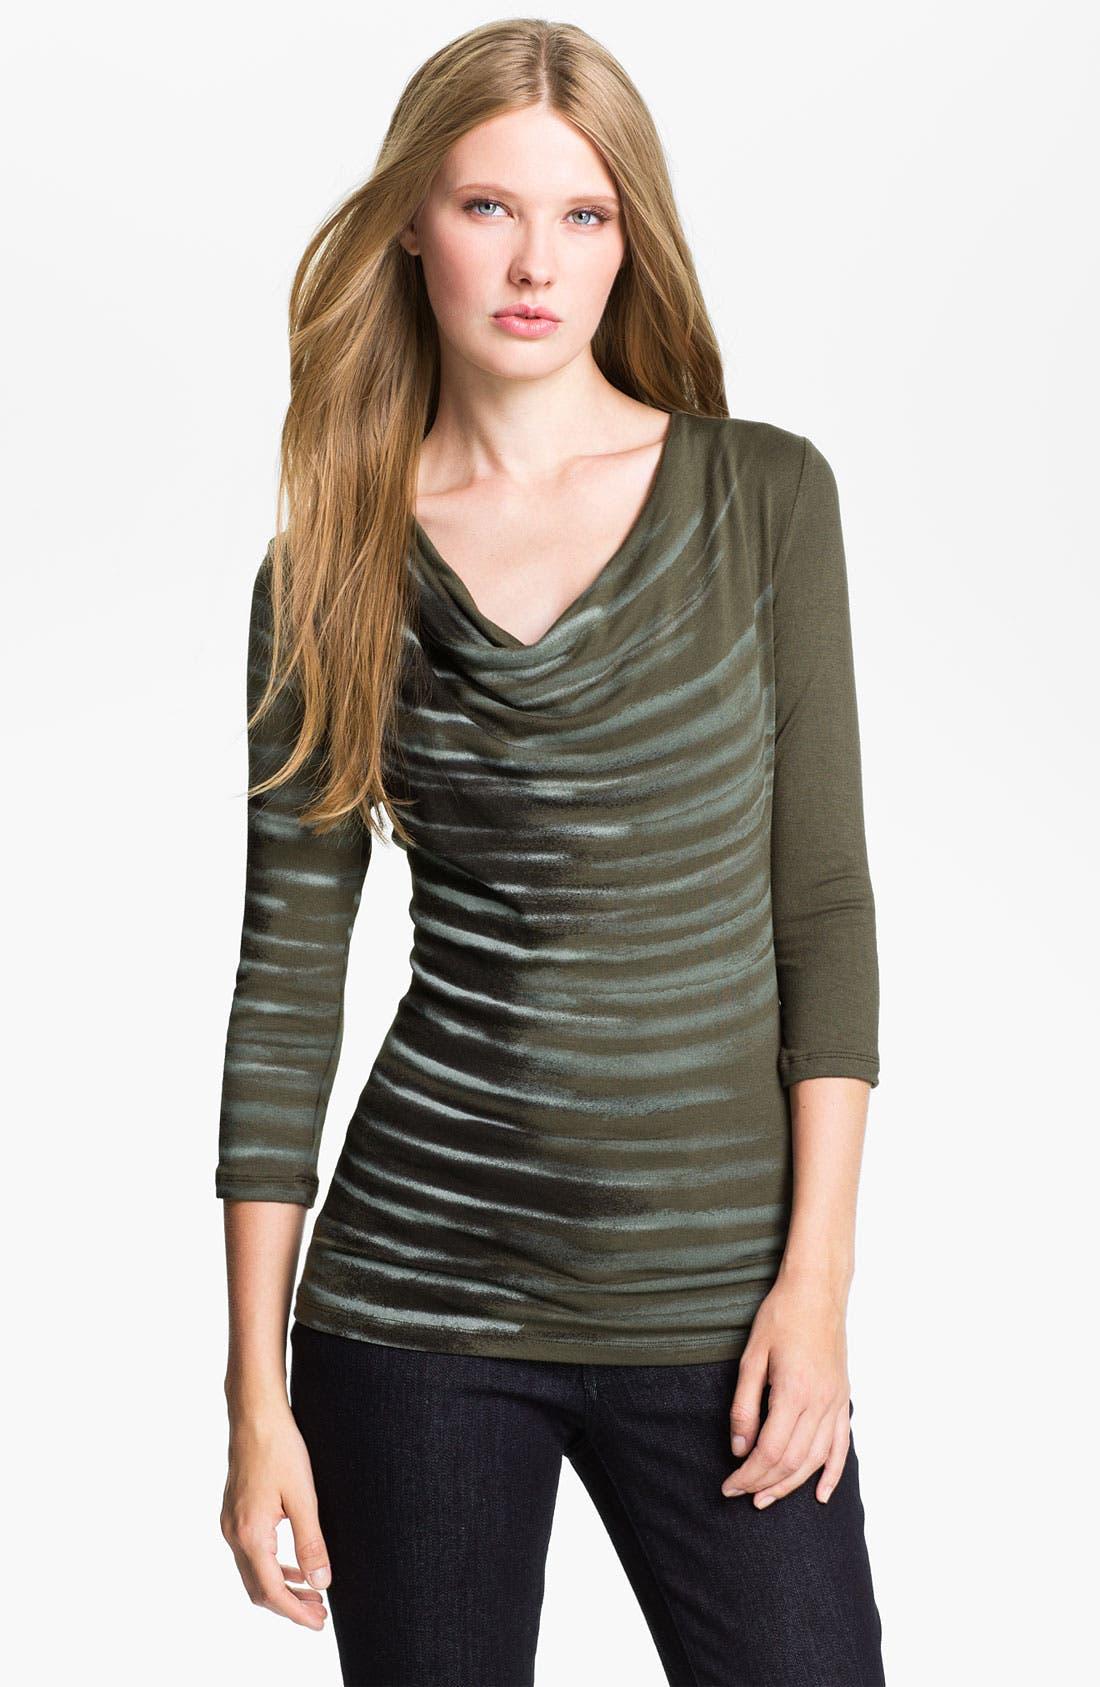 Alternate Image 1 Selected - Edista 'Elisa' Drape Neck Top (Petite)